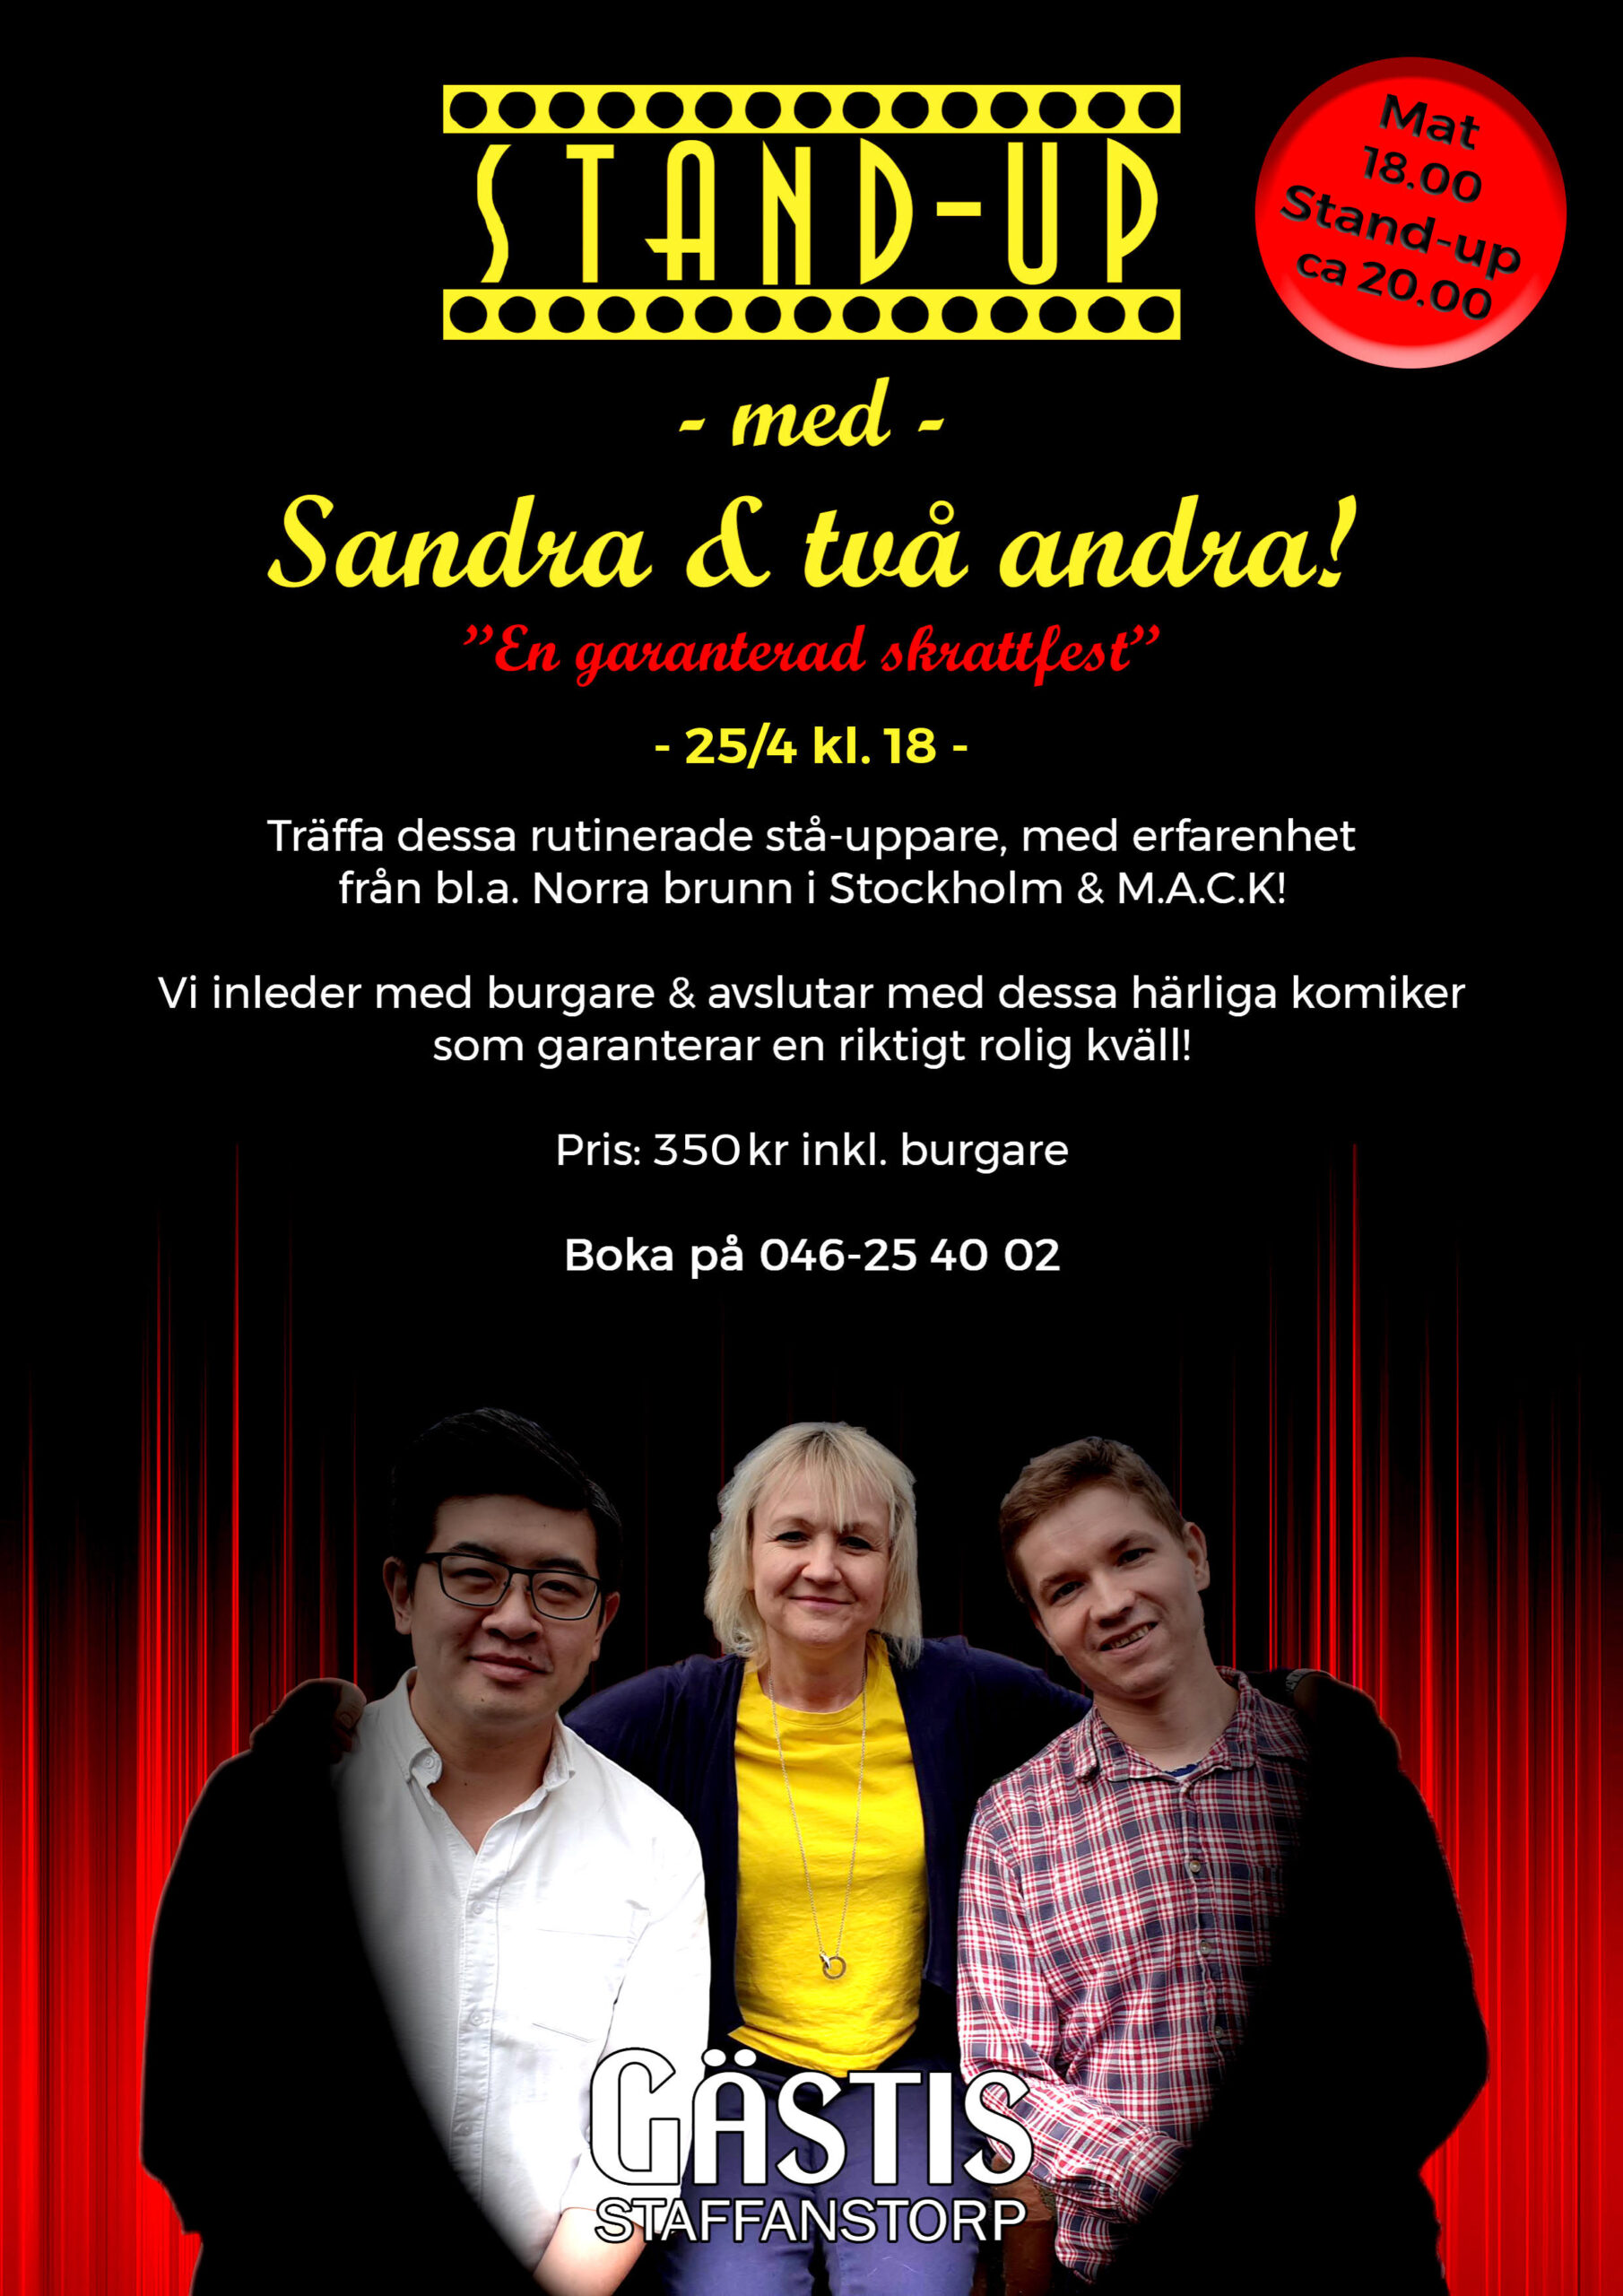 Standup, mack, comedy, underhållning, stand-up, norra brunn